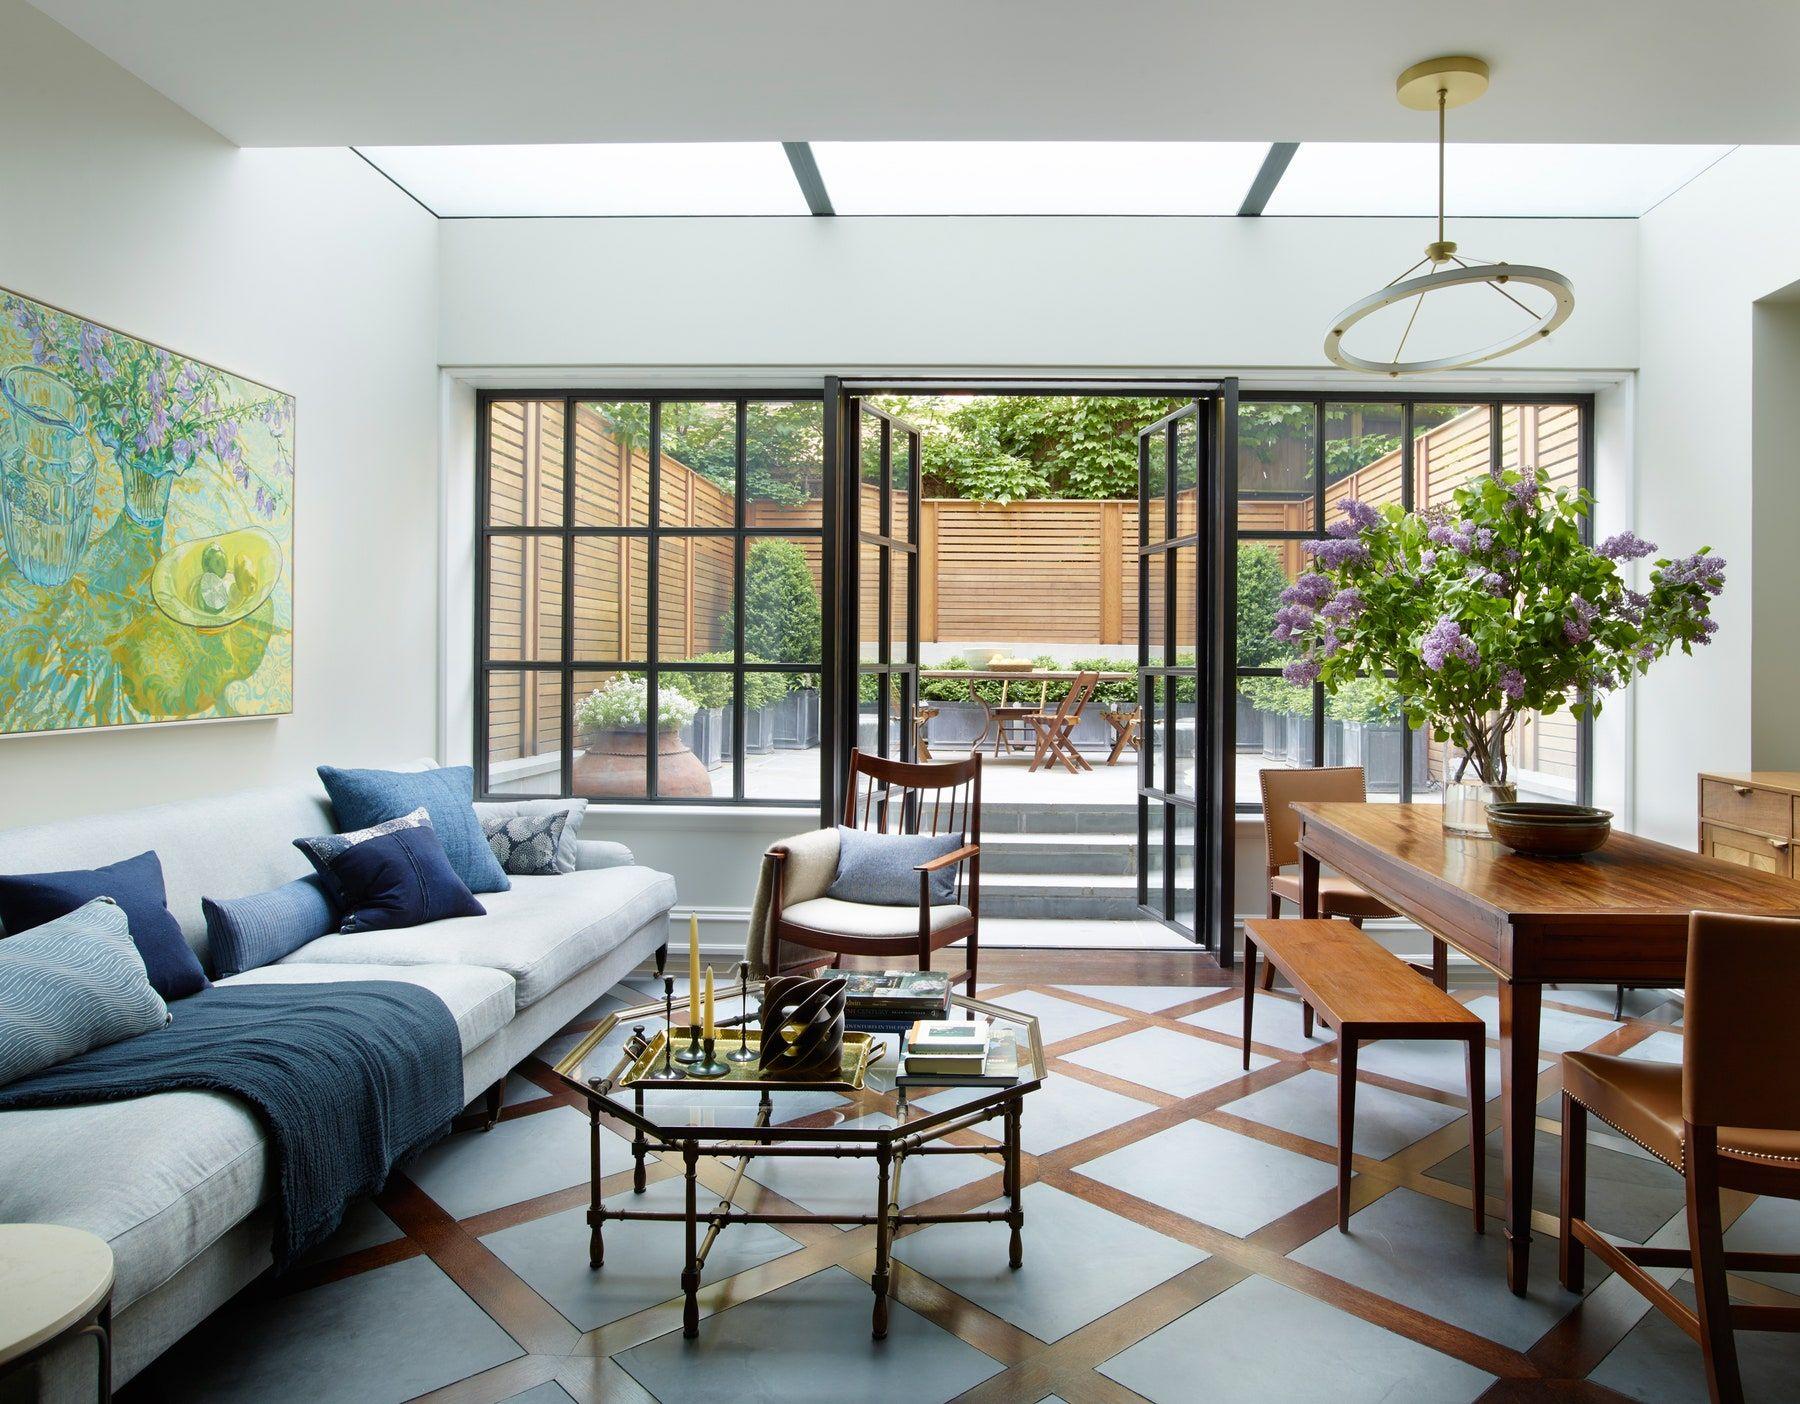 An Elegant New York Townhouse Is Reborn Architectural Digest New York Townhouse New Home Construction Townhouse